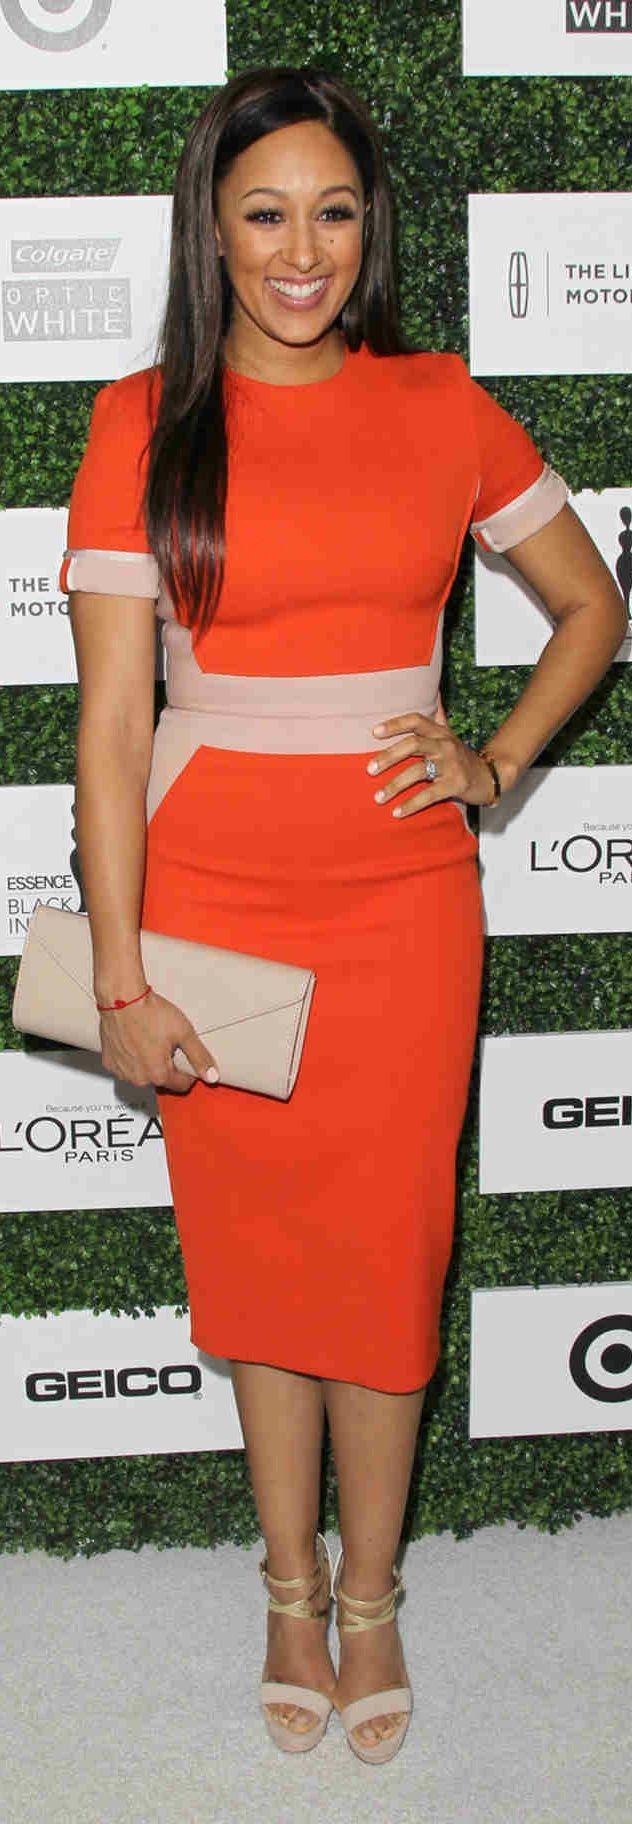 Tamera Mowry- Housley. I like this little tangerine dress